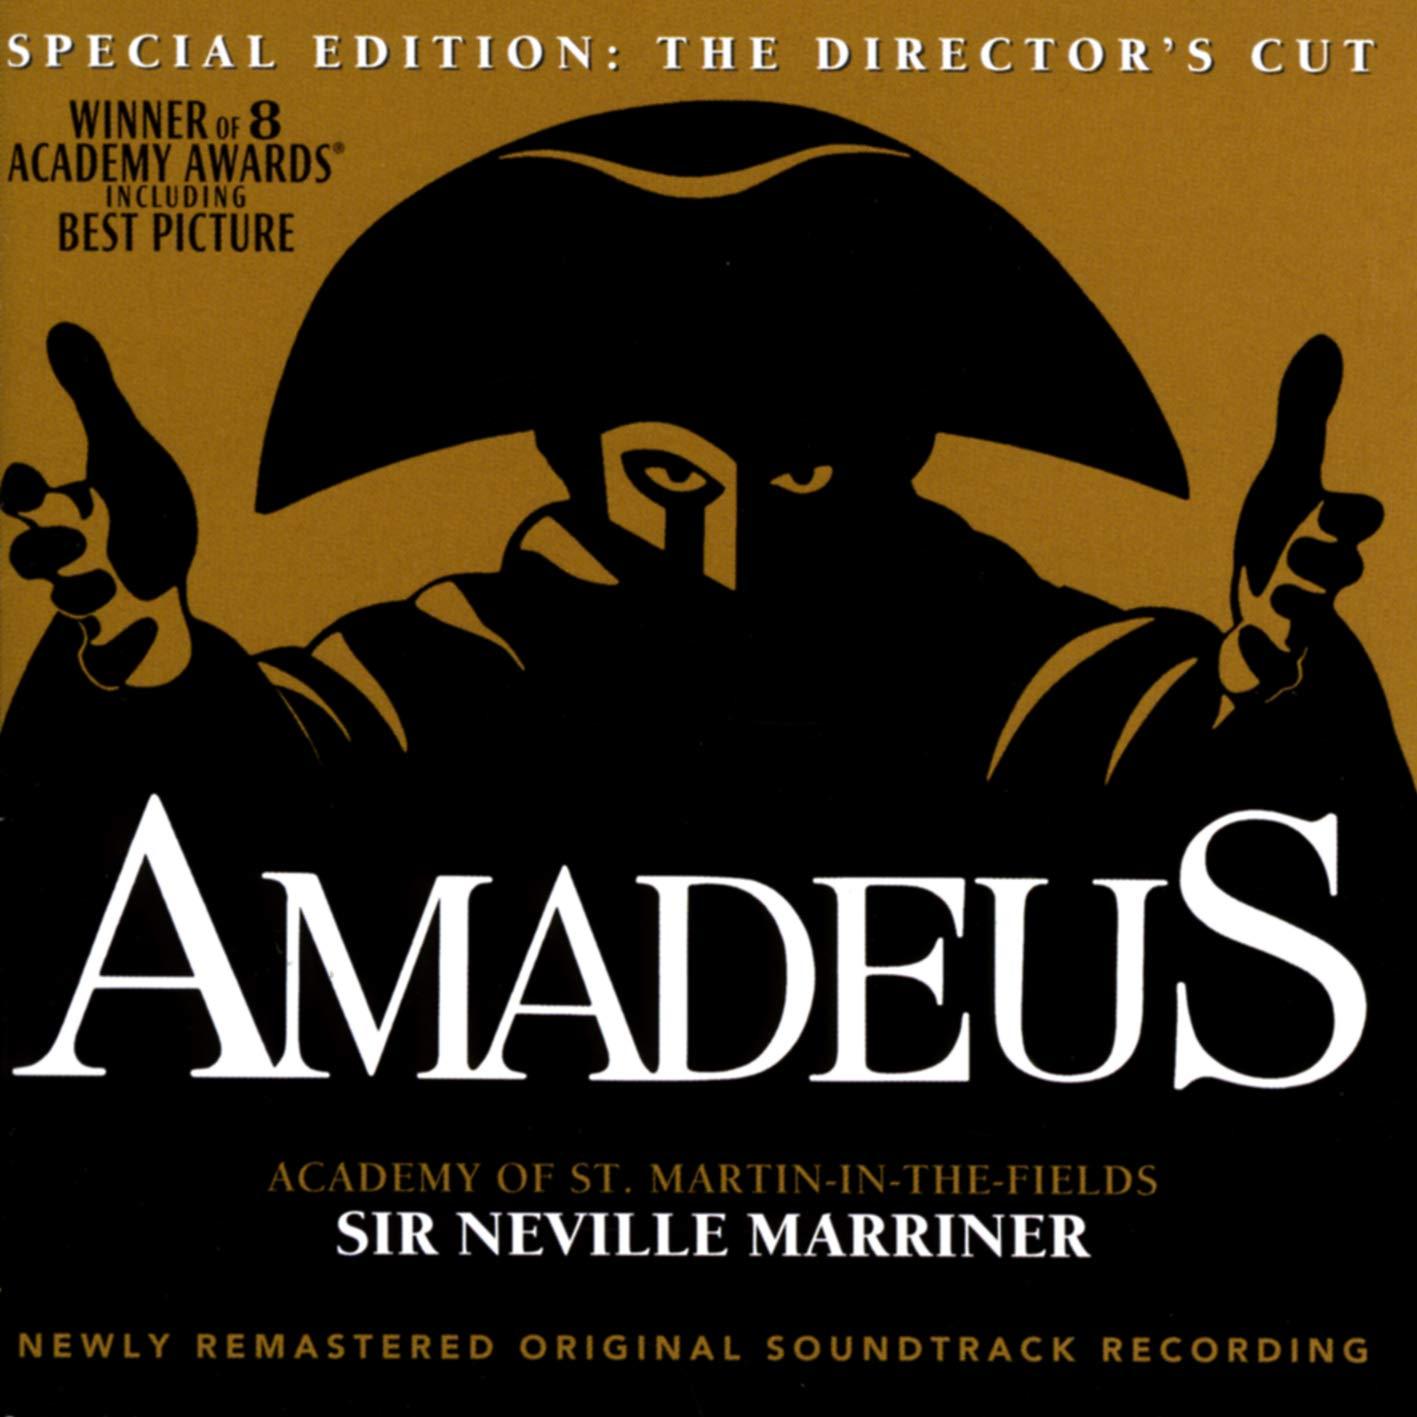 Amadeus the Director's Cut]